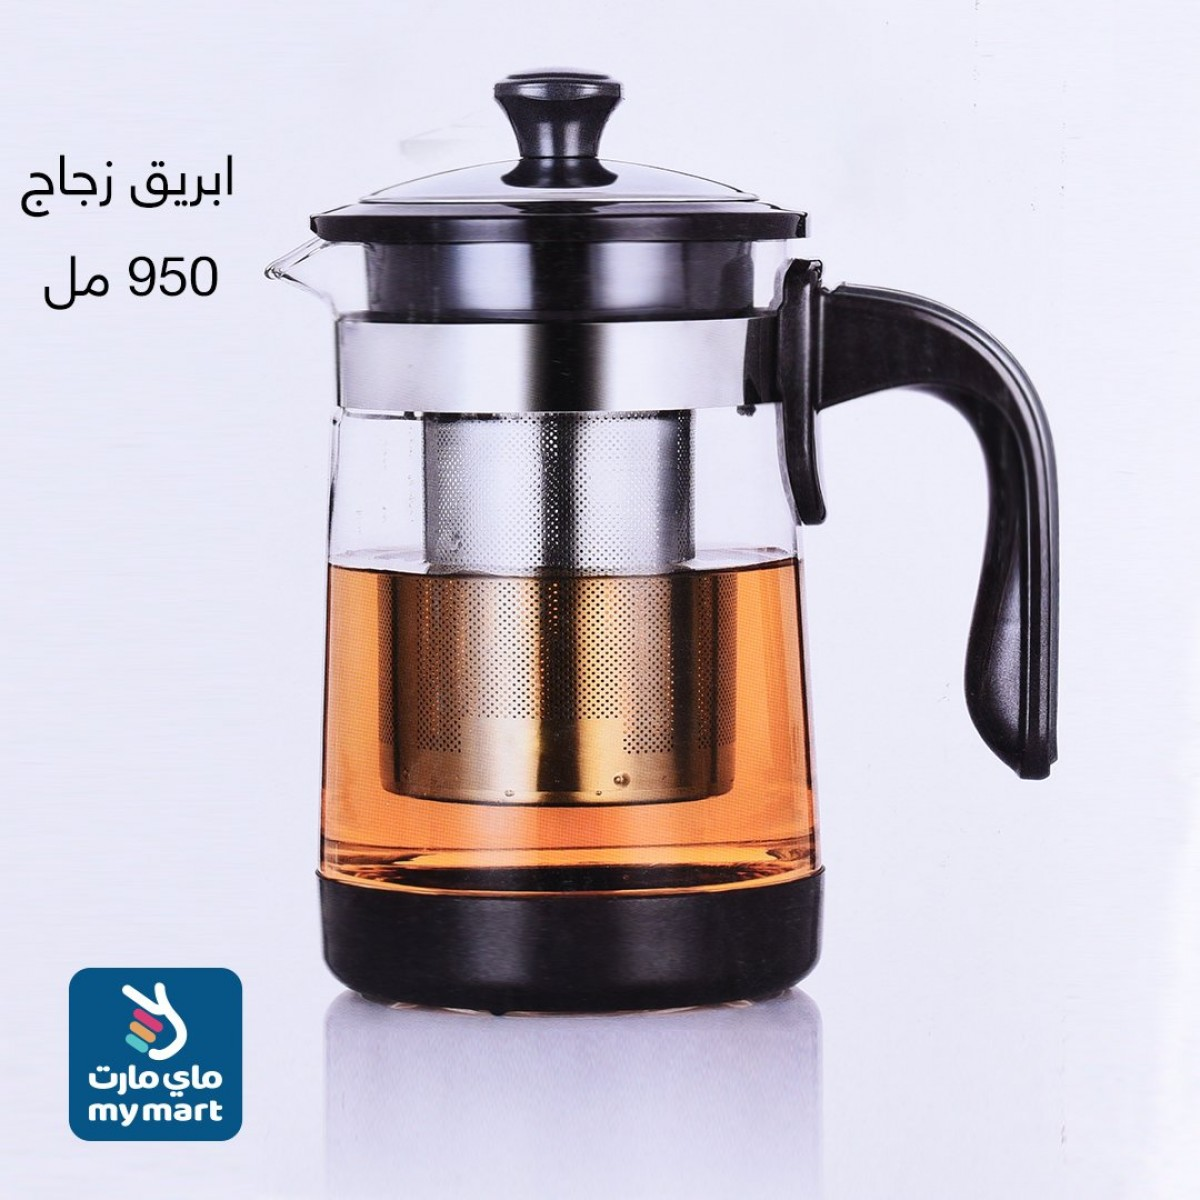 ابريق شاي زجاج مع مصفاه داخلية , مقاس 950 مل